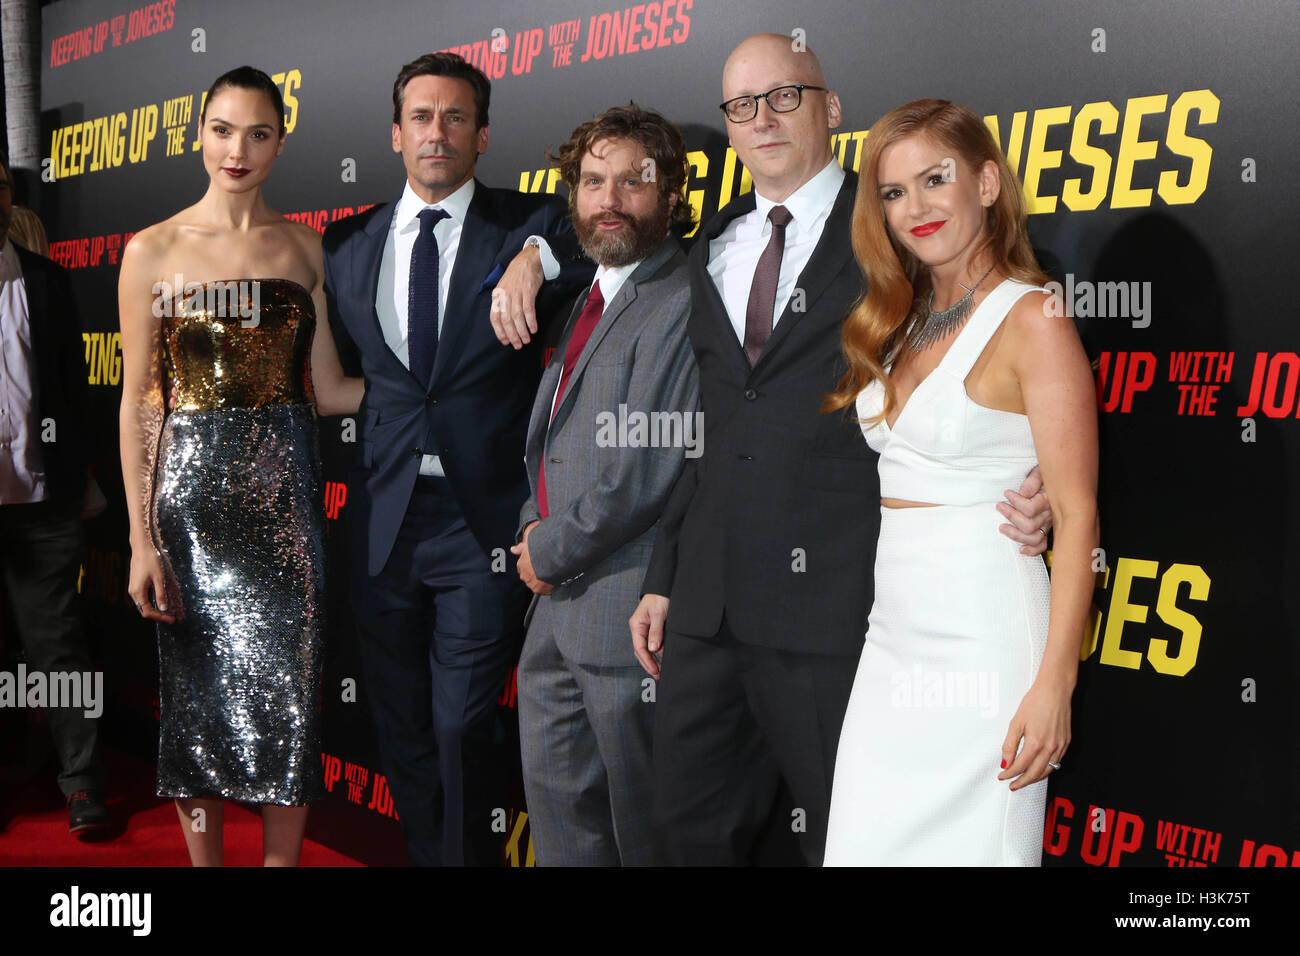 LOS ANGELES, CA - 8 octobre: Gal Gadot, Jon Hamm, Zach Galifianakis, Greg Mottola, Isla Fisher, à la Photo Stock